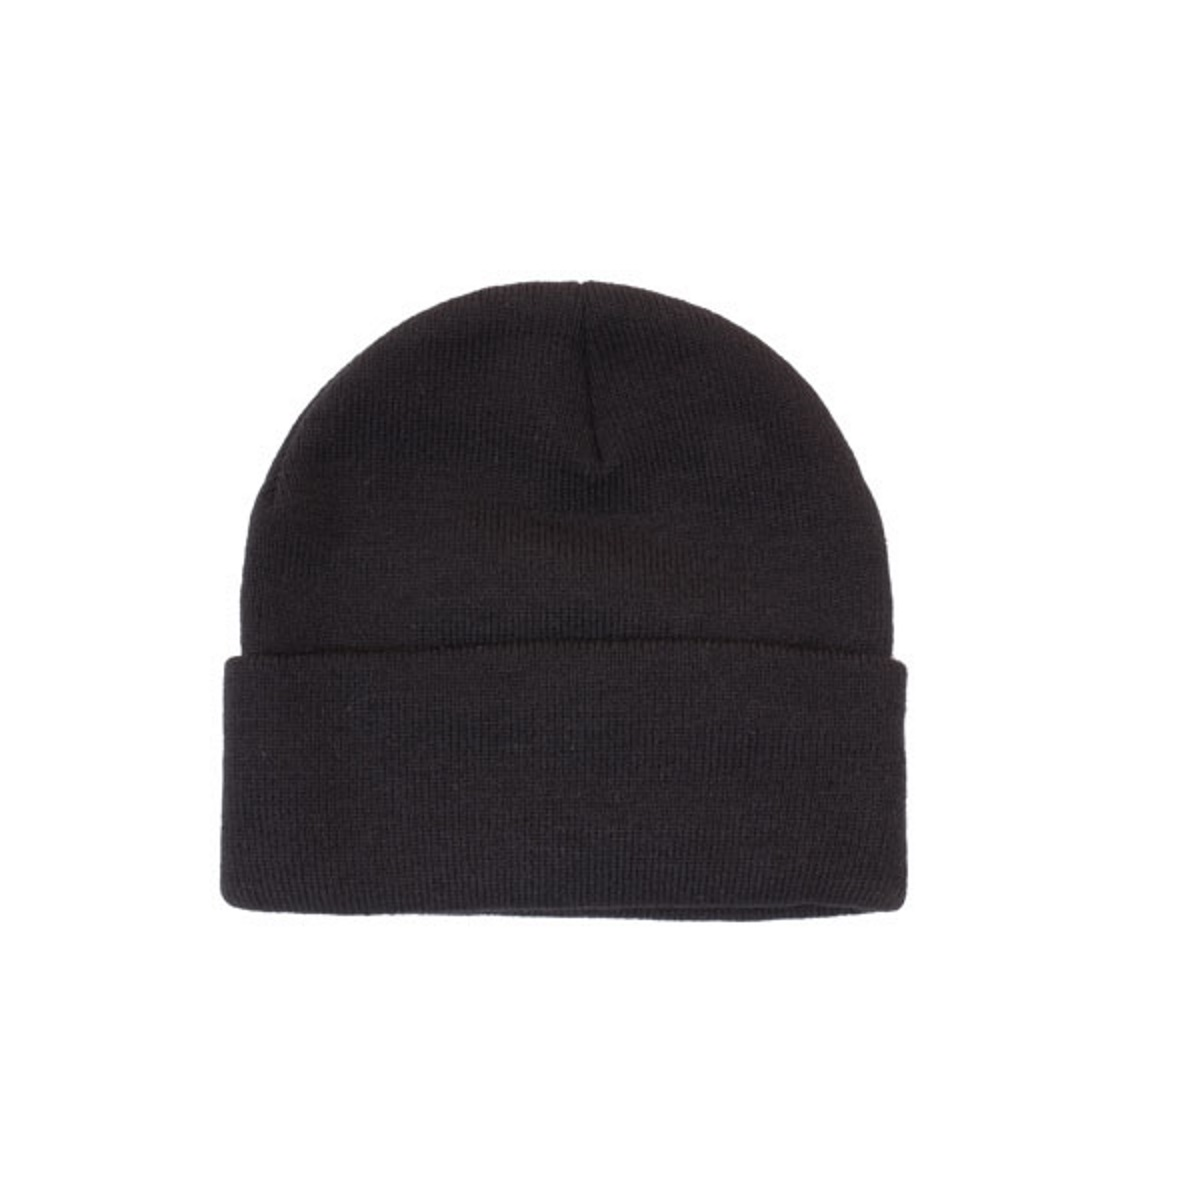 6faad0e0c53 Acrylic Knitted Beanie Hat